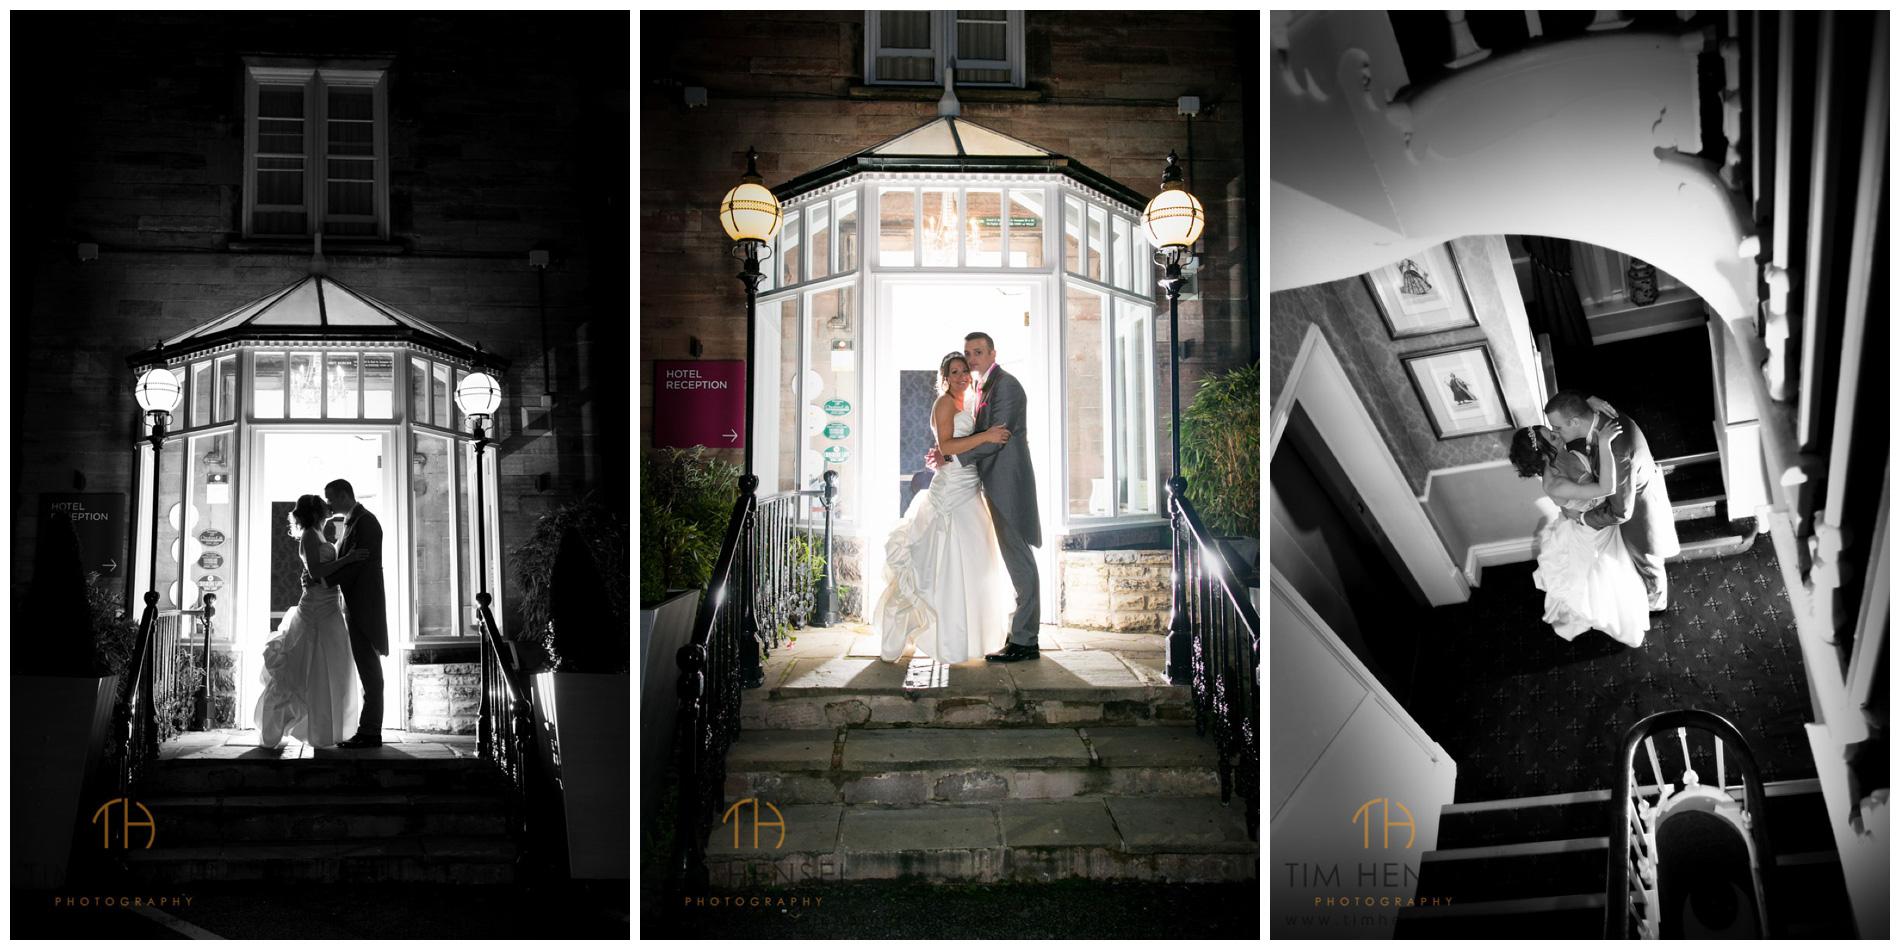 Wedding Photography at Alderley Edge Hotel